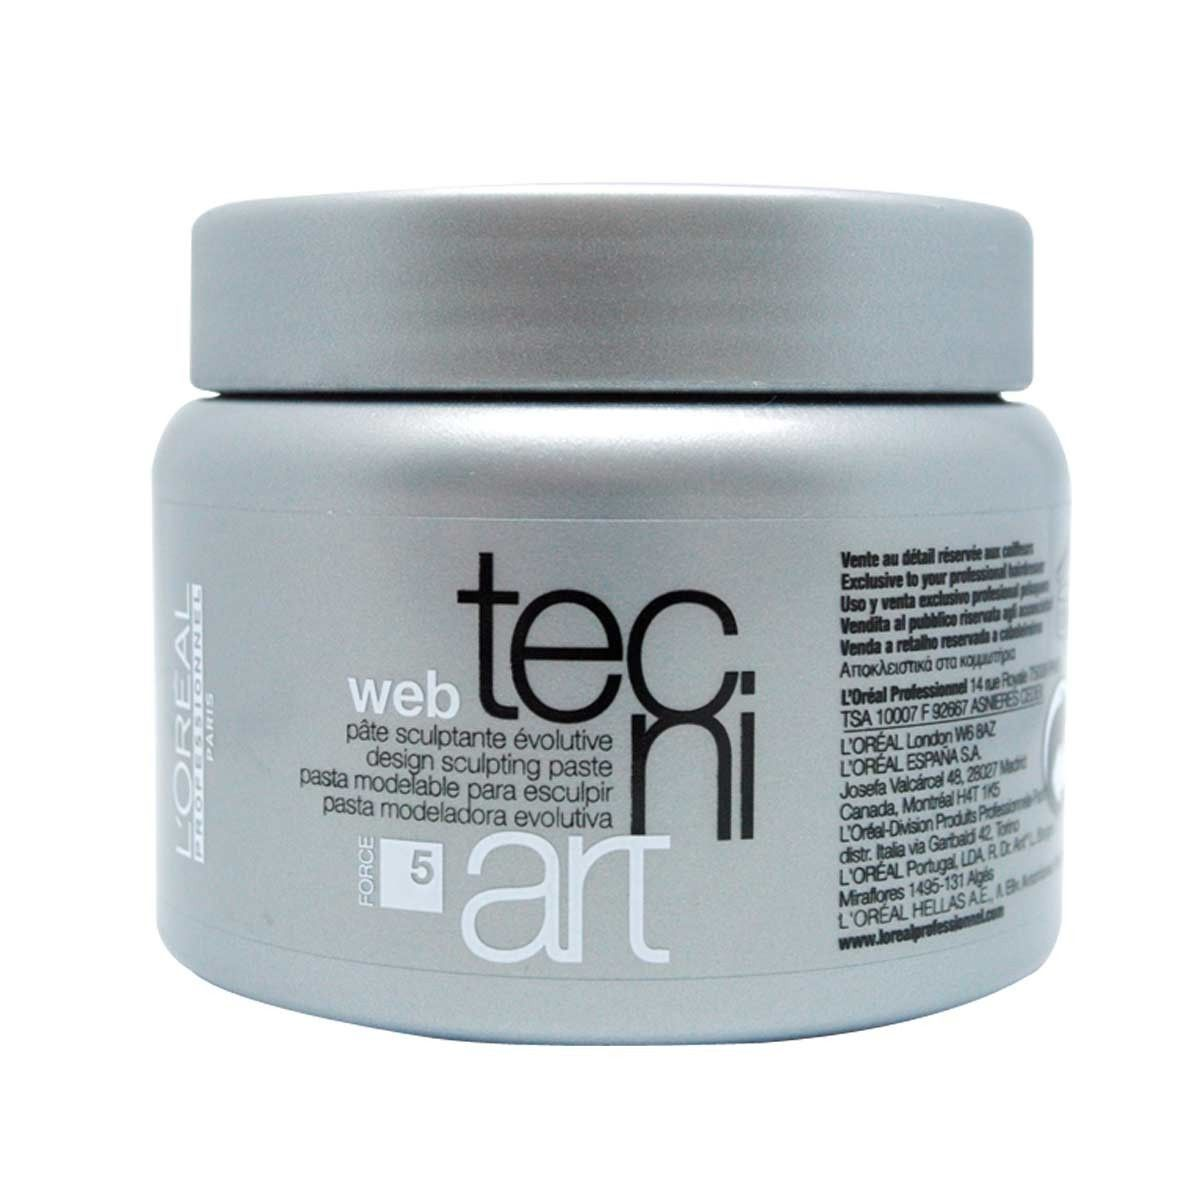 Pasta Modeladora Tecni.Art A Head Web Loreal 150ml